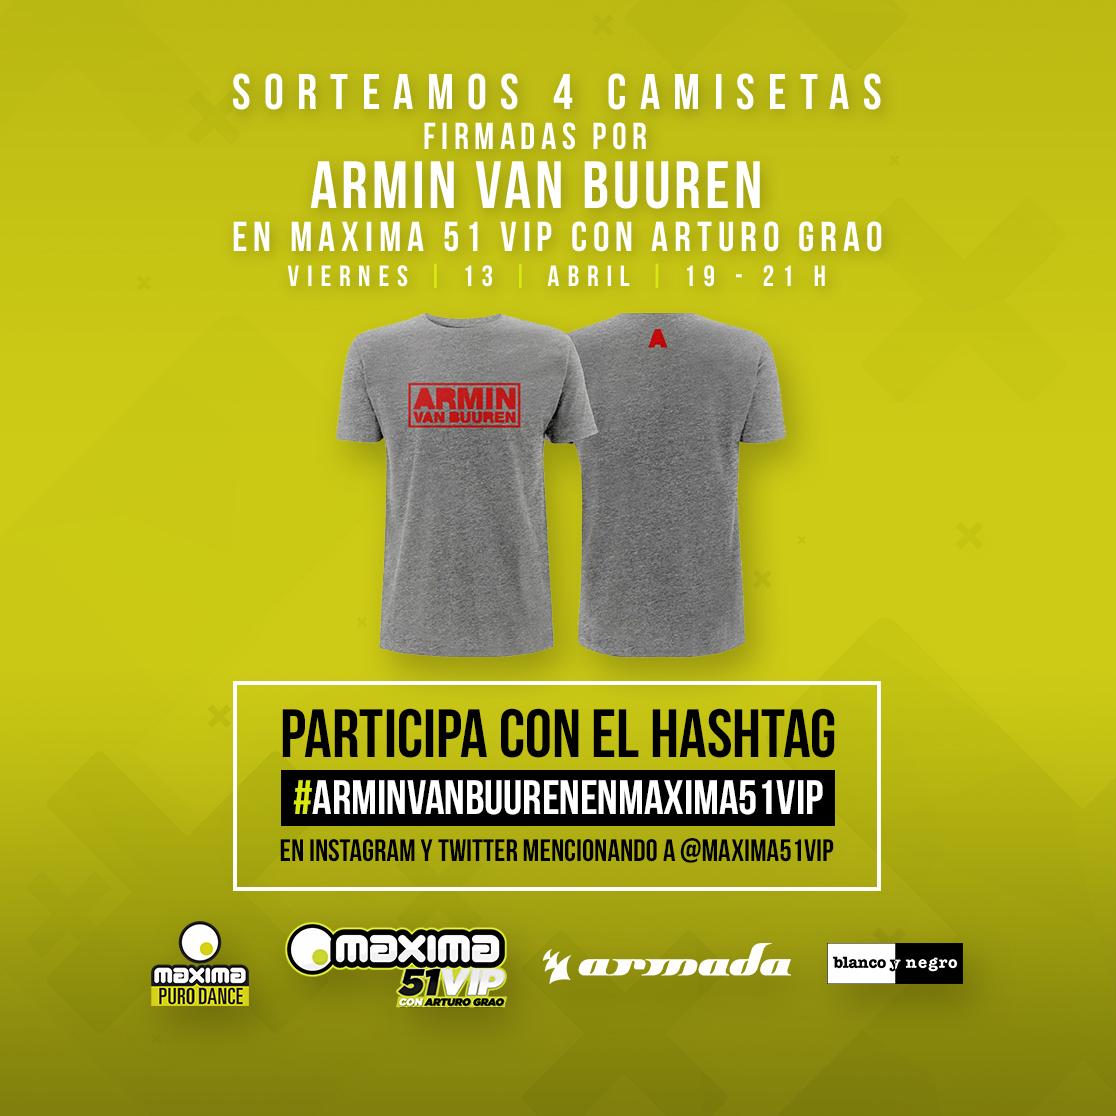 Maxima 51 VIP regala camisetas firmadas por Armin van Buuren